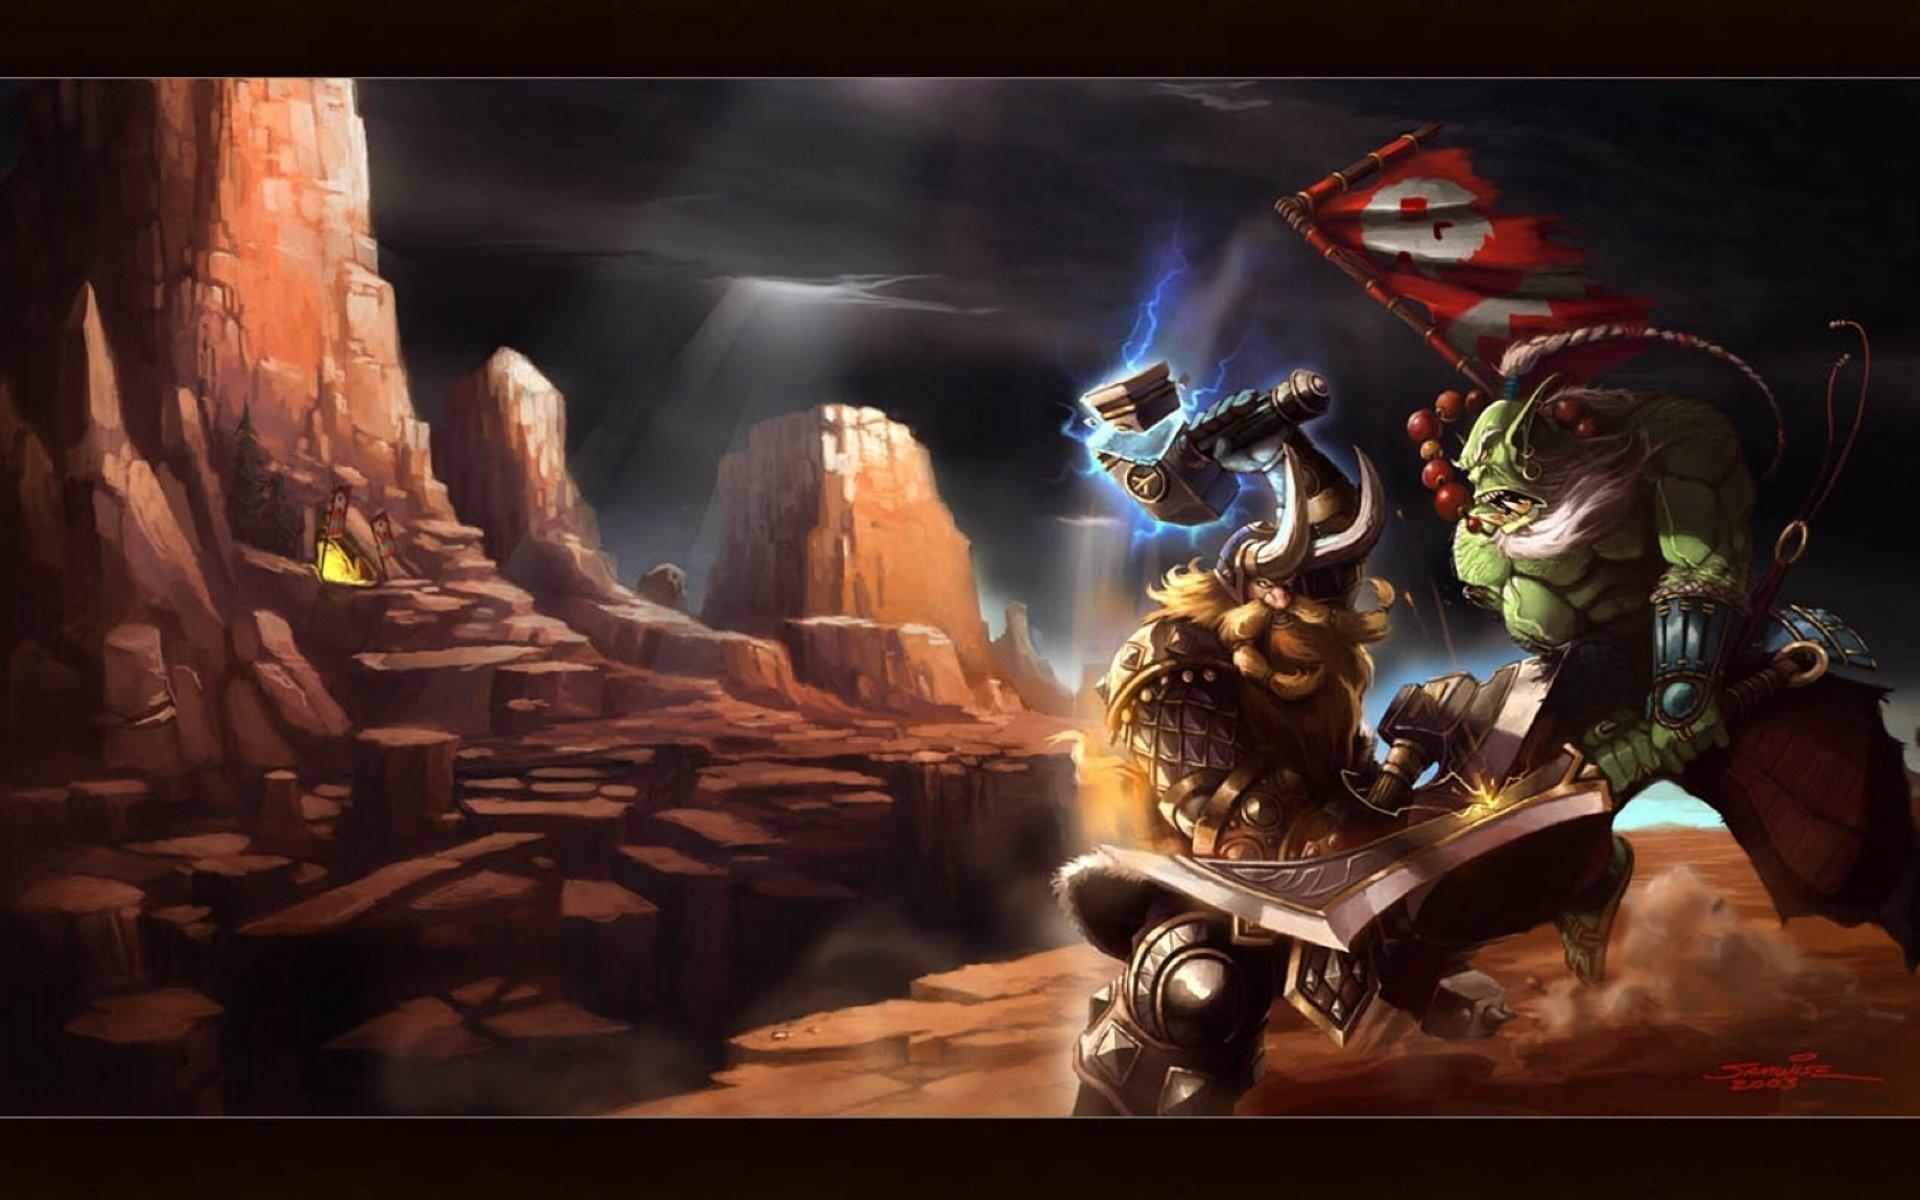 DWARF fantasy warrior art artwork f wallpaper | | 697489 |  WallpaperUP